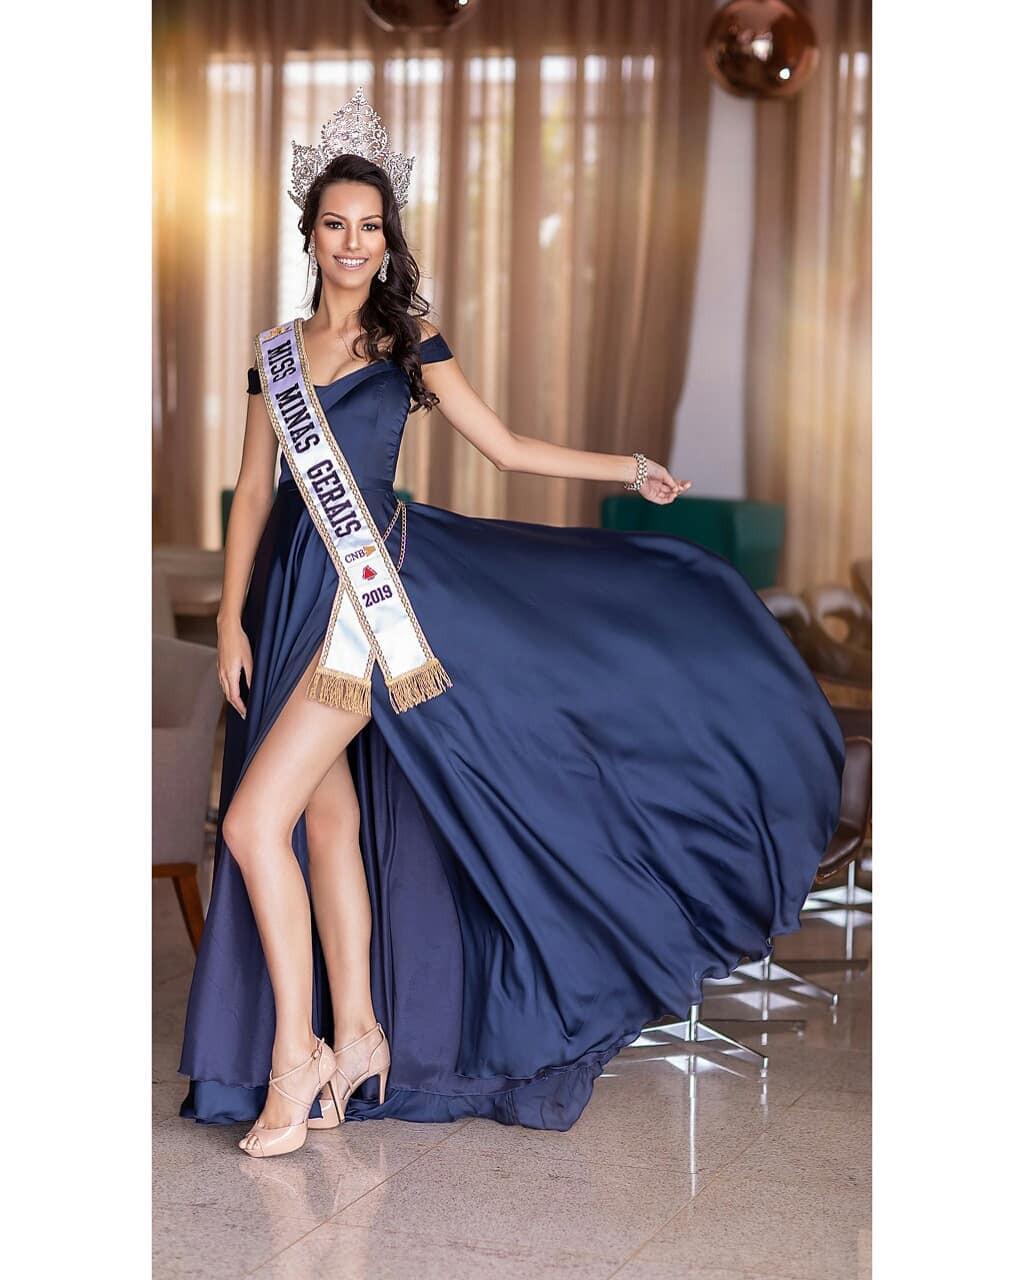 rafaella felipe, top 20 de miss brasil mundo 2019. - Página 2 Qlbghv10